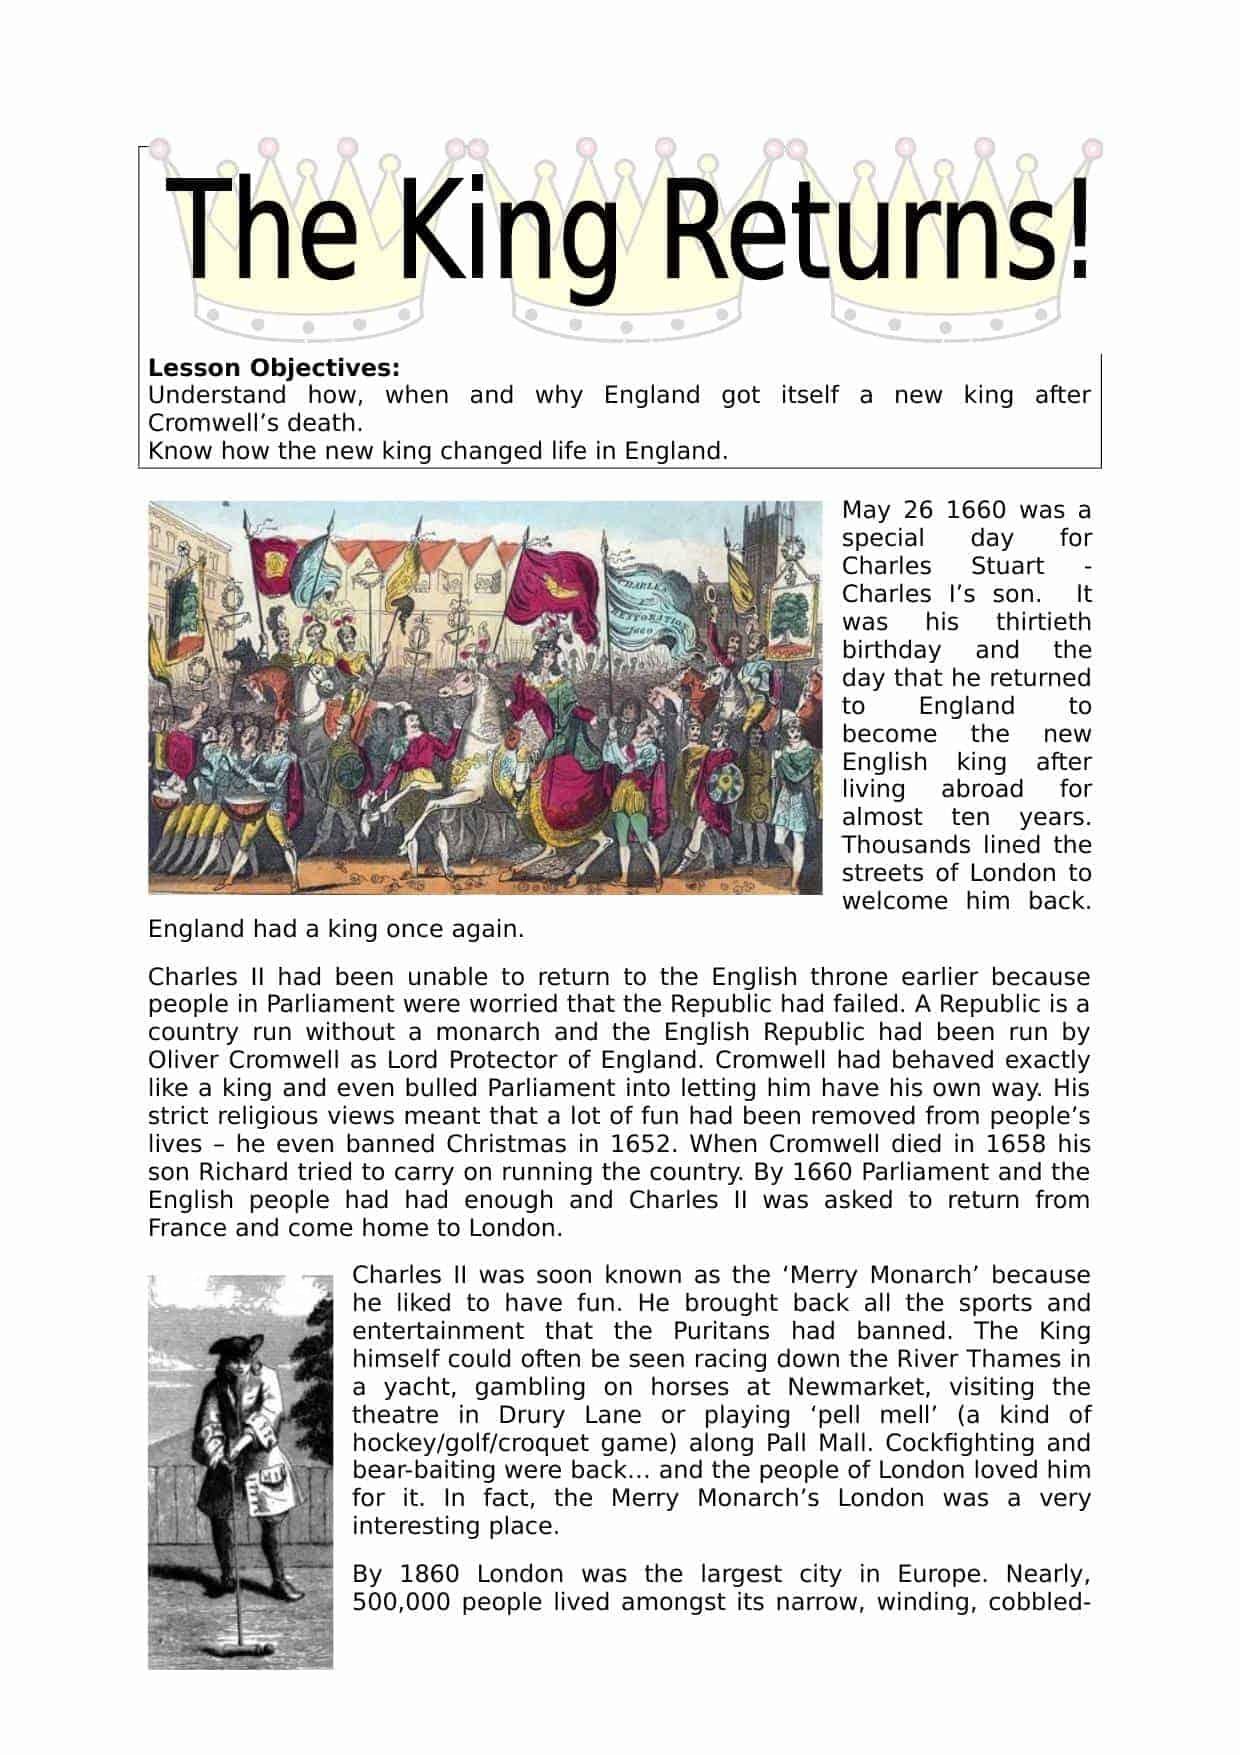 Charles Stuart As King